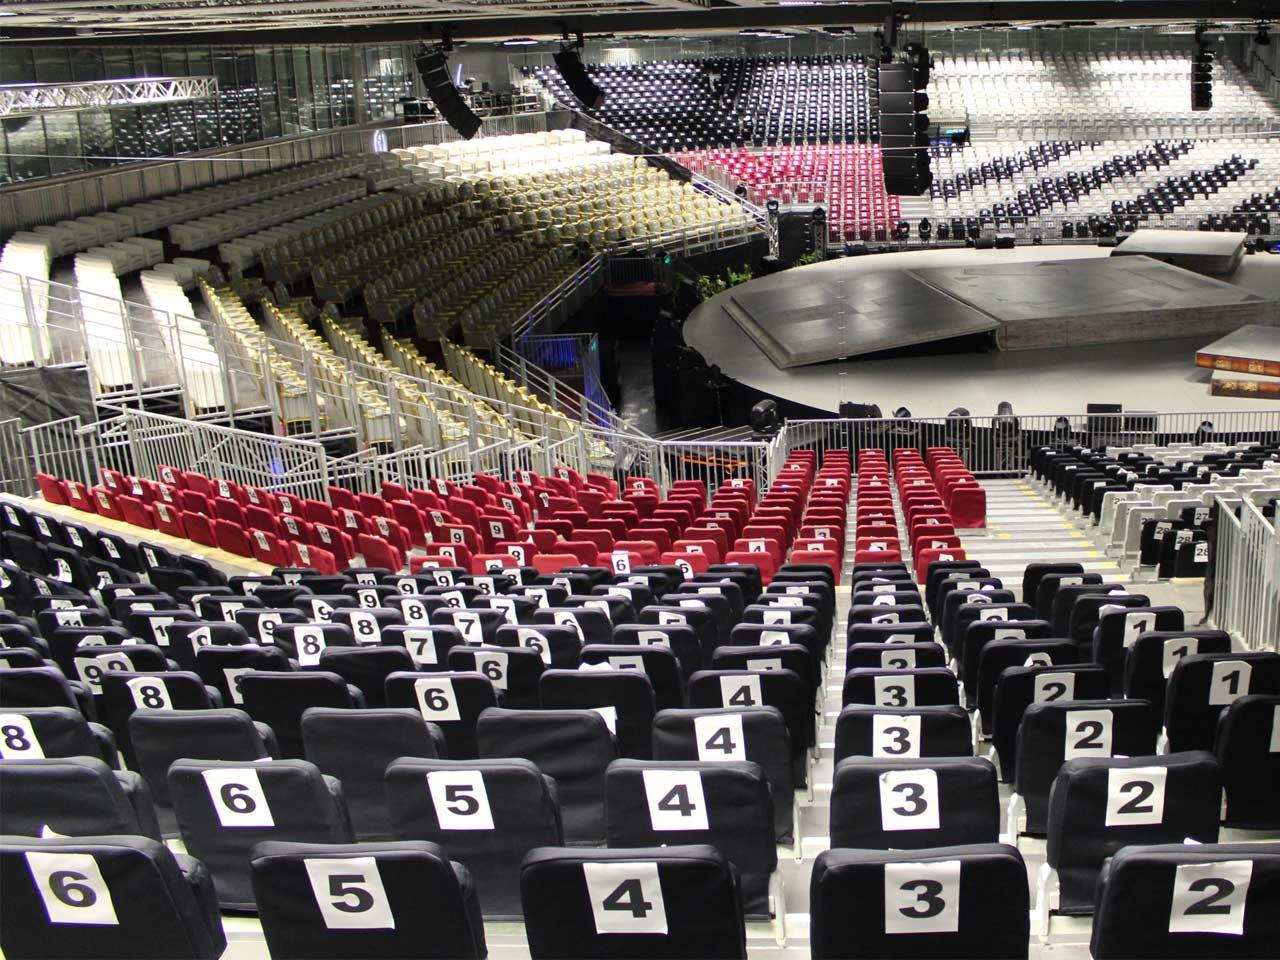 grandstand-seats-events-setup-rental-stadium-seating-sport-management-film-festival-seating-screening-f1-open-air-cinema-16